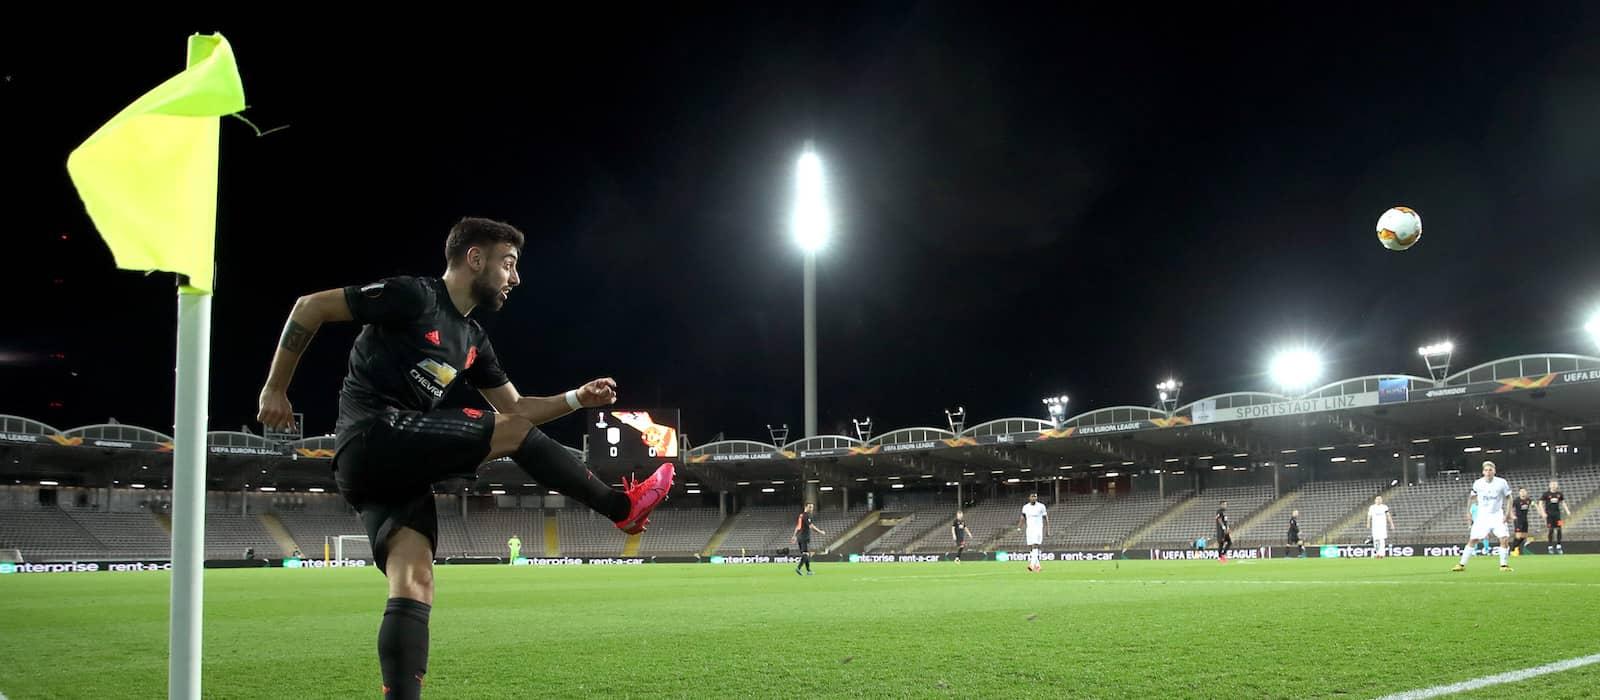 Video: Manchester United star Bruno Fernandes scores stunning volley in training